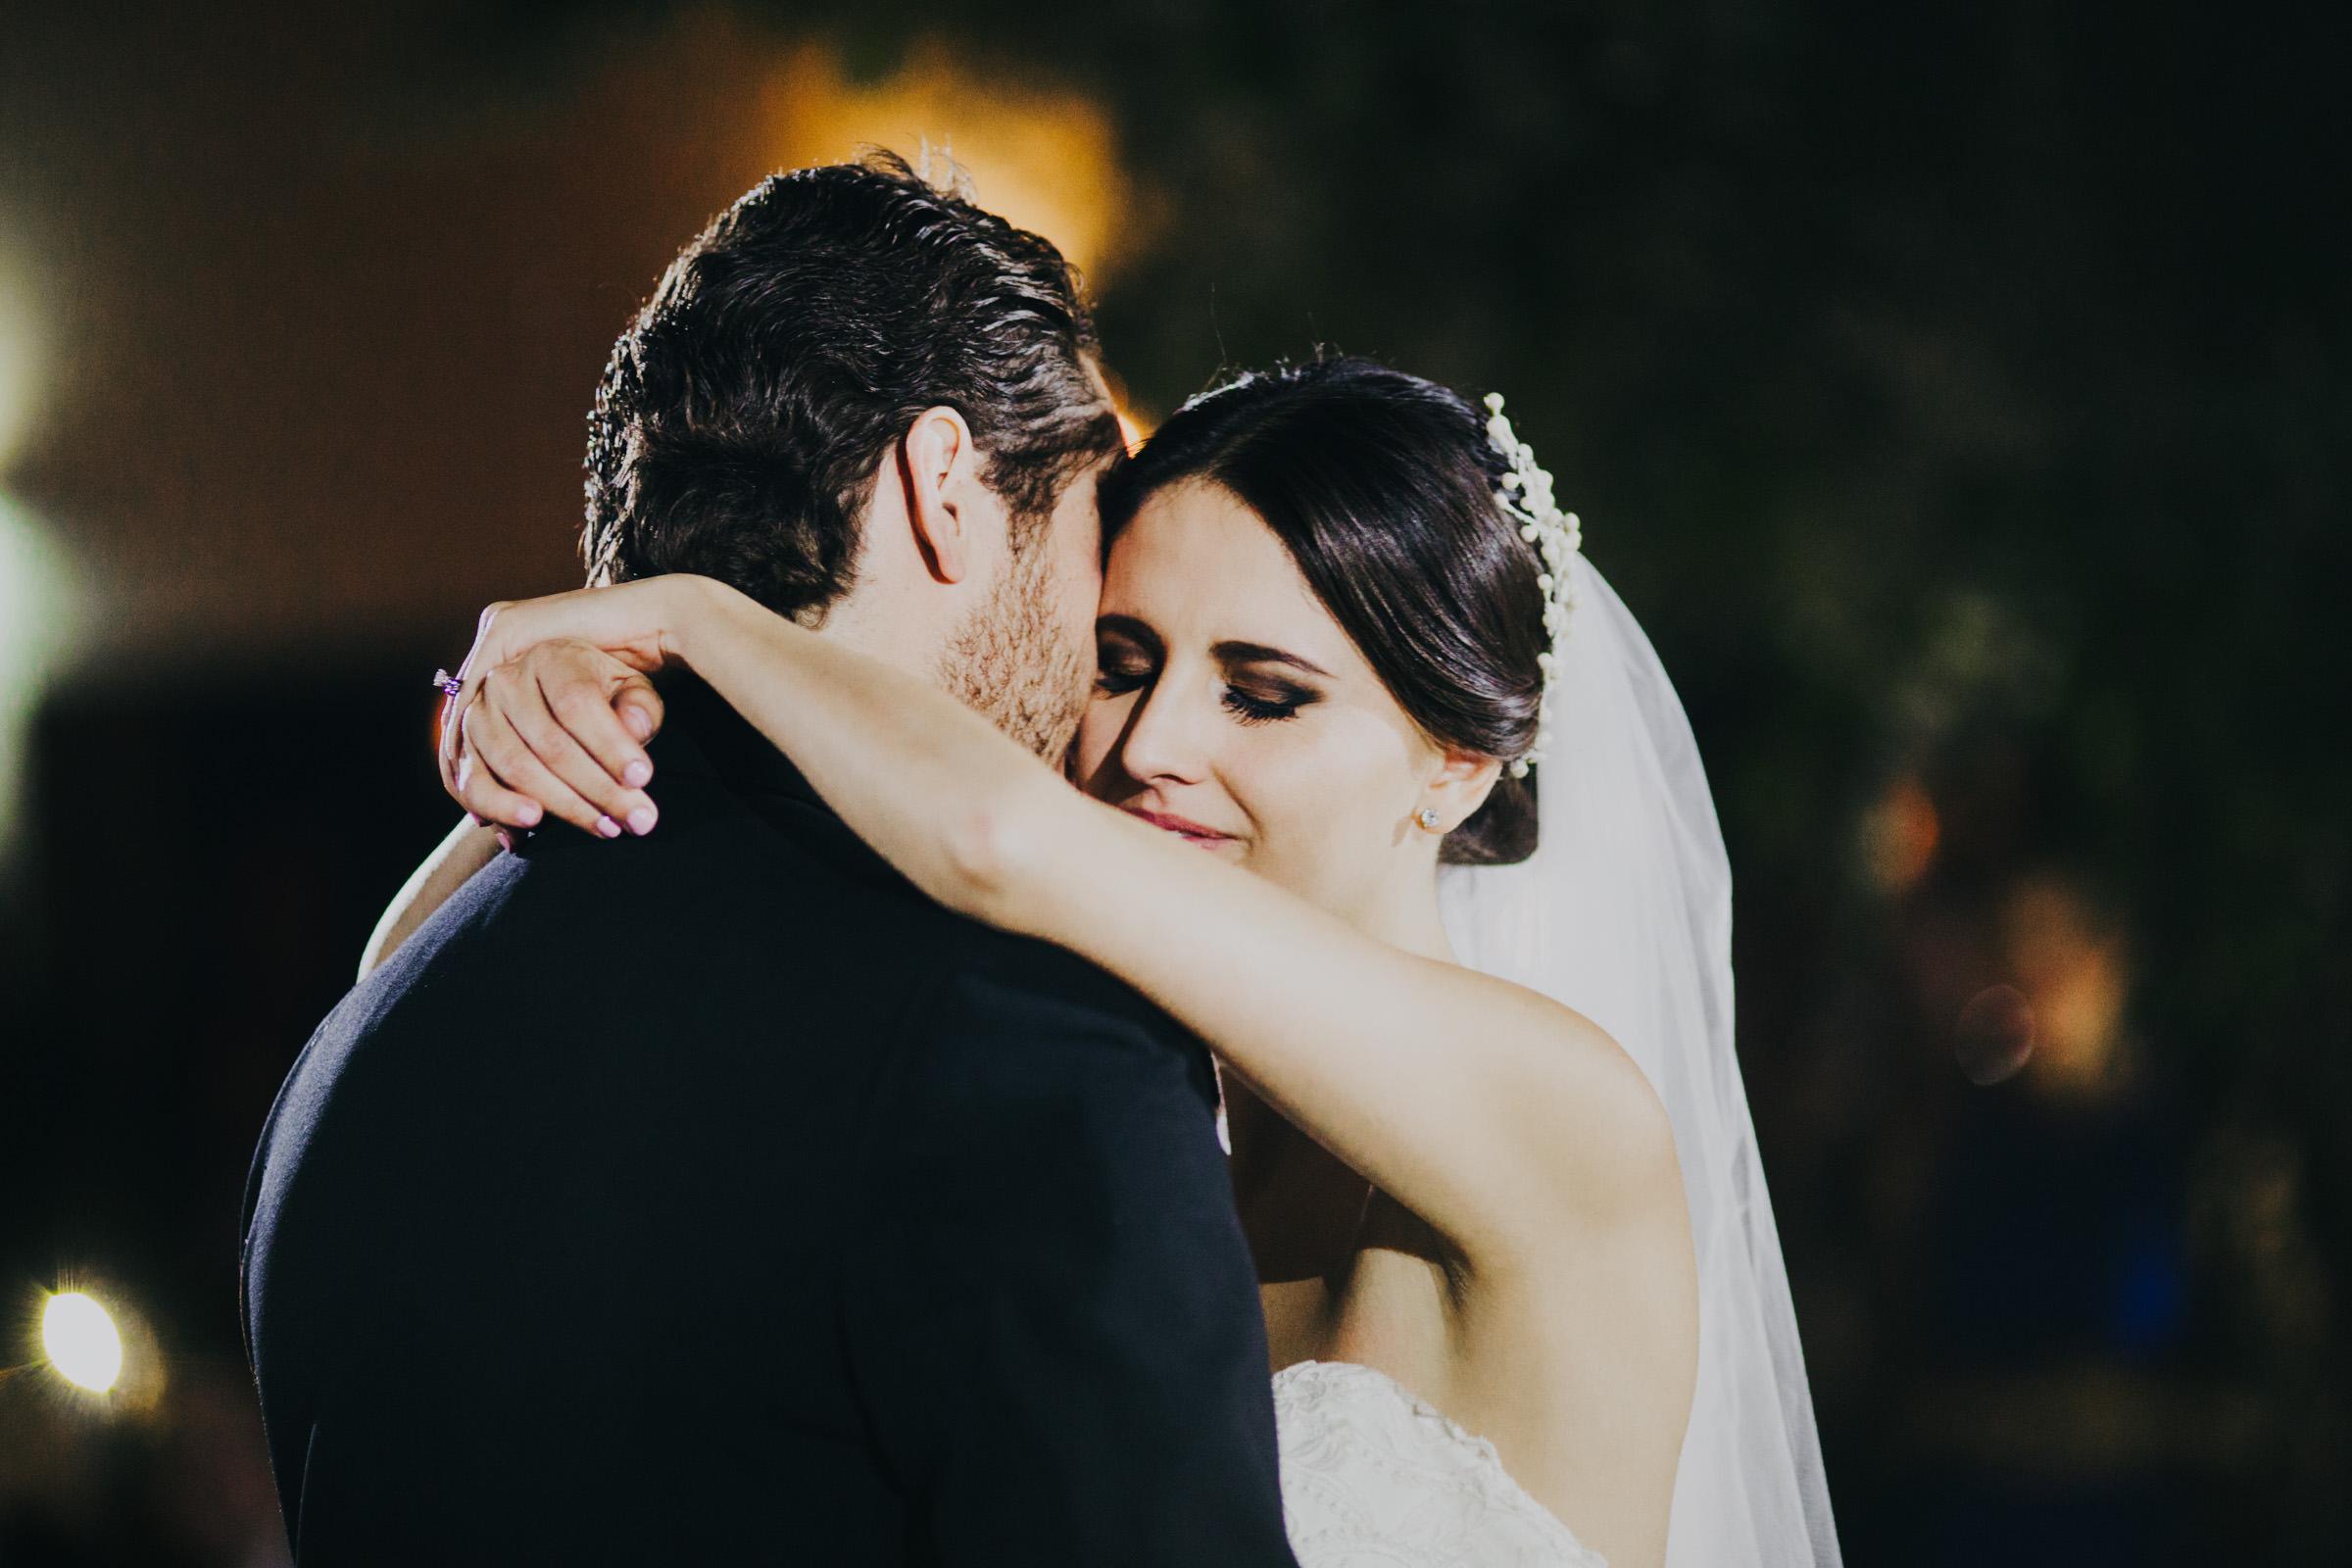 irapuato-boda-fotografia-jardines-alcalde-guanajuato-paulina-juan-pedro--136.jpg